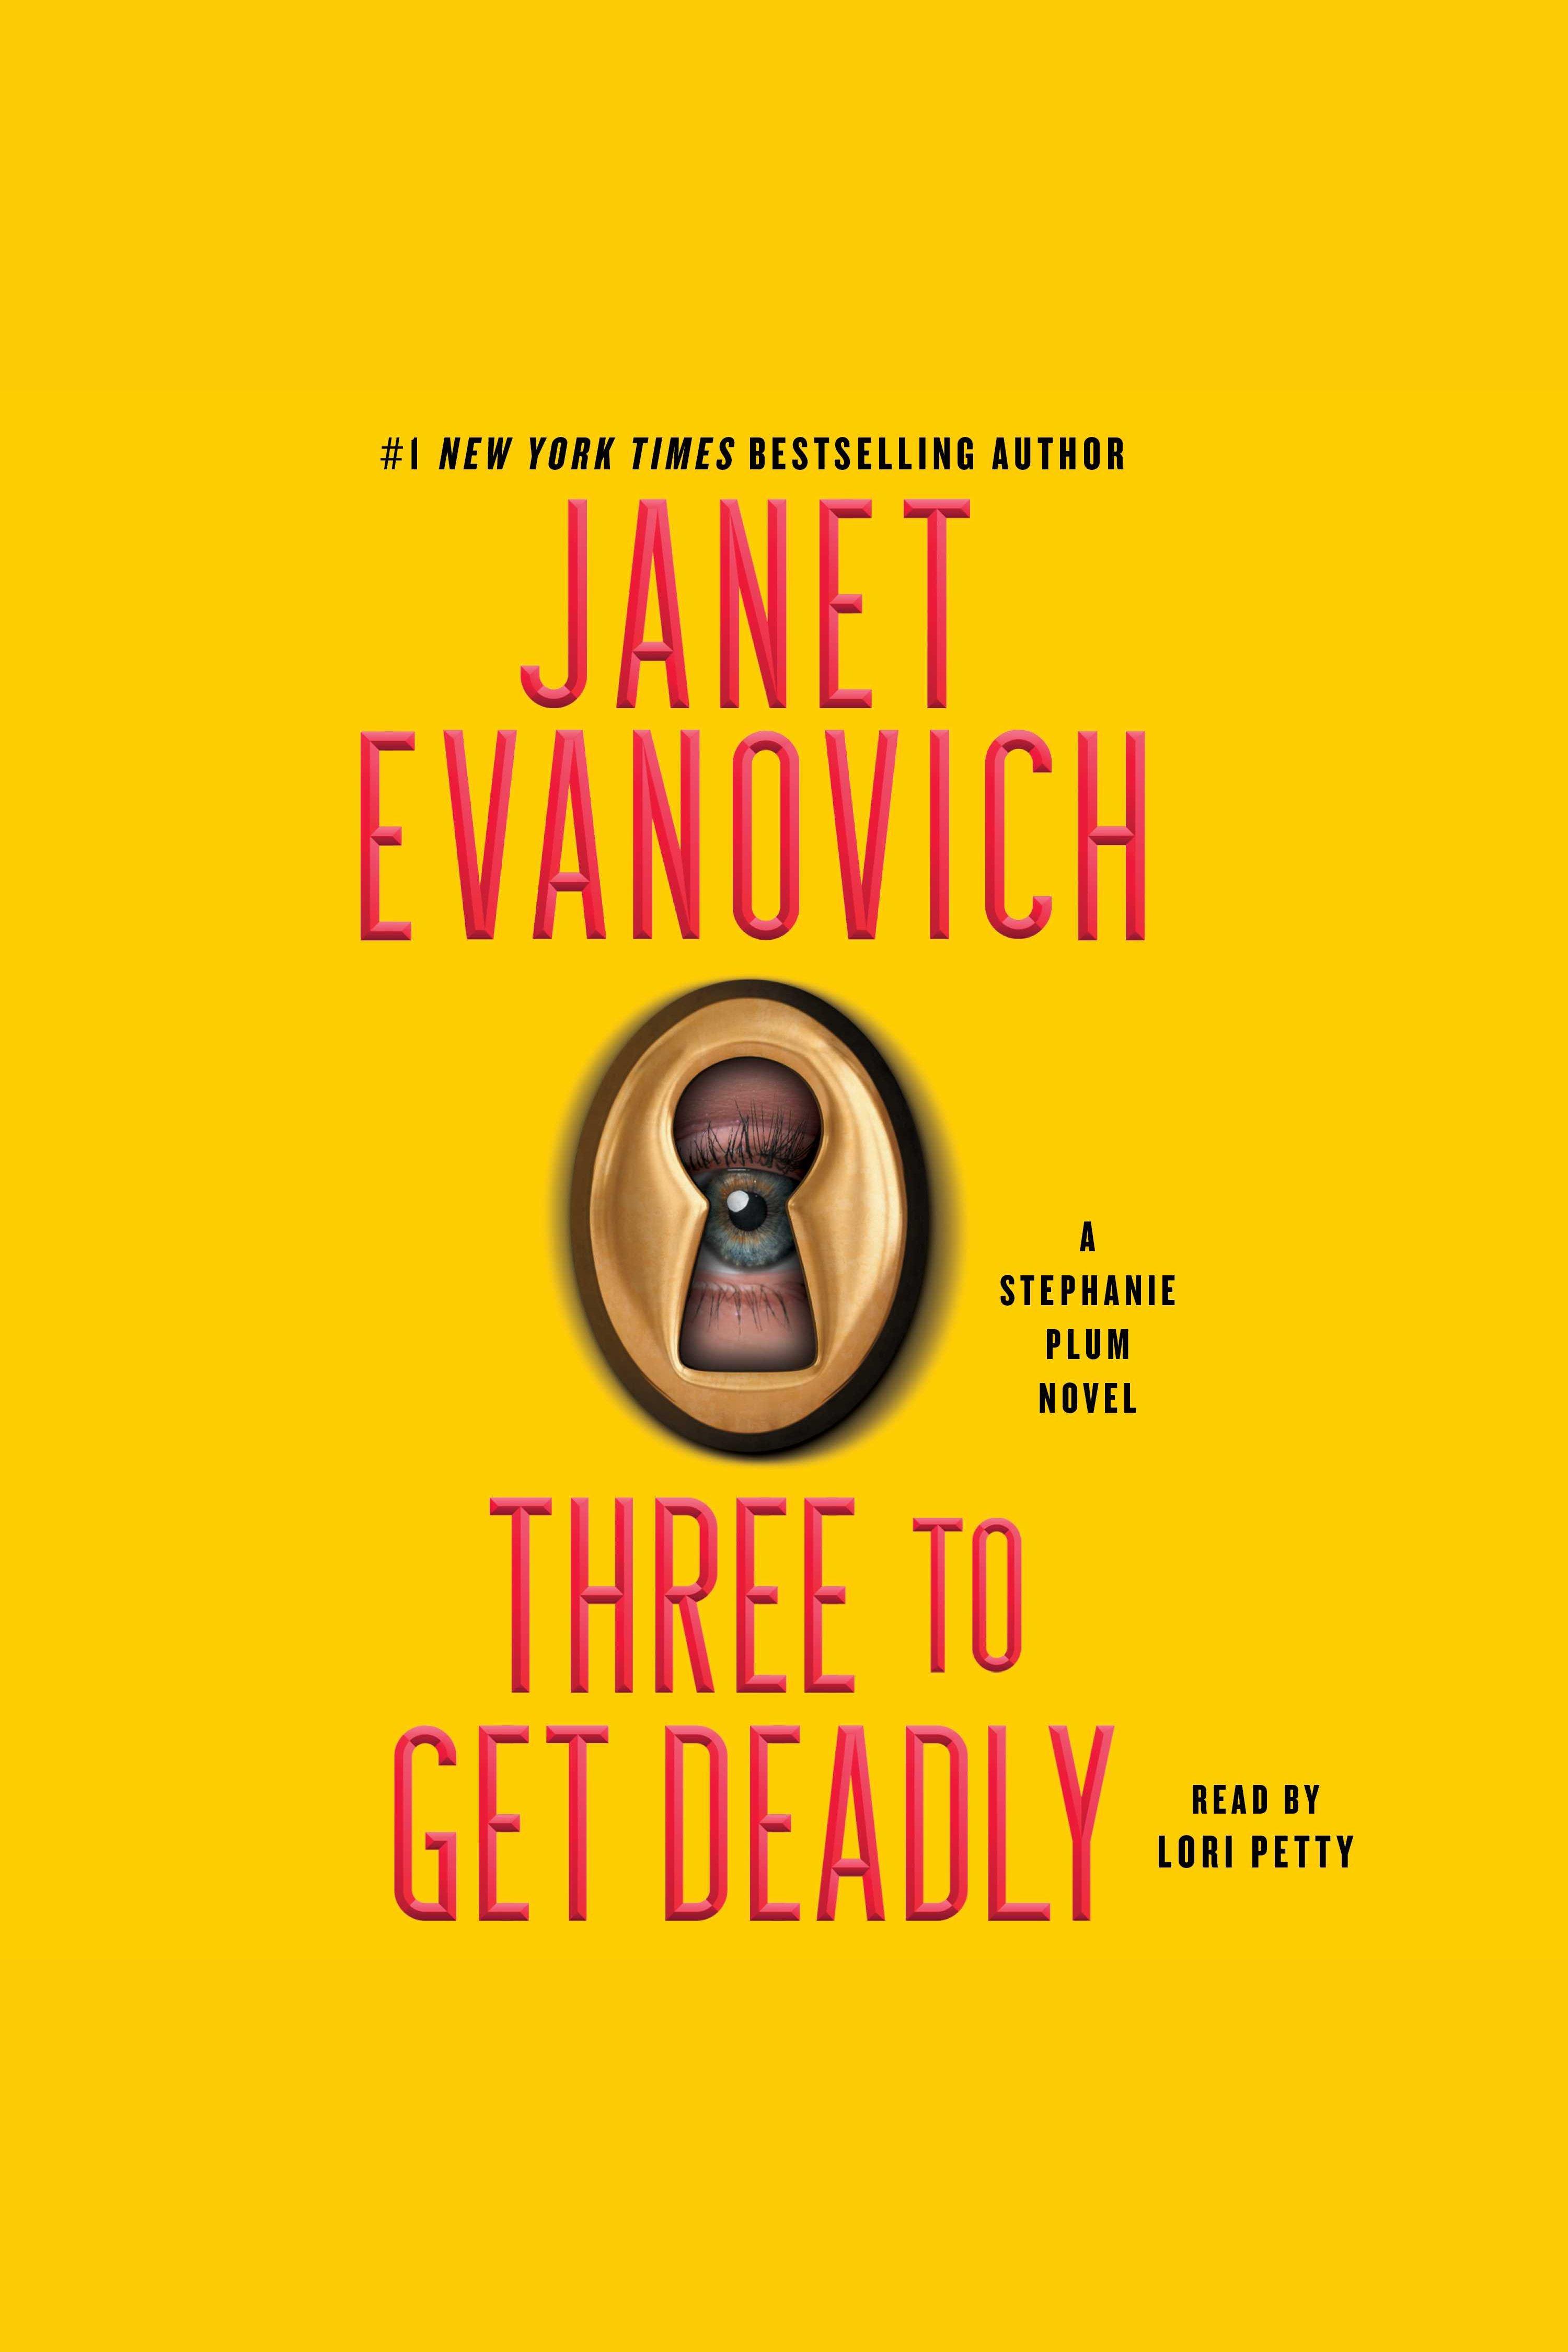 Three to Get Deadly A Stephanie Plum Novel cover image